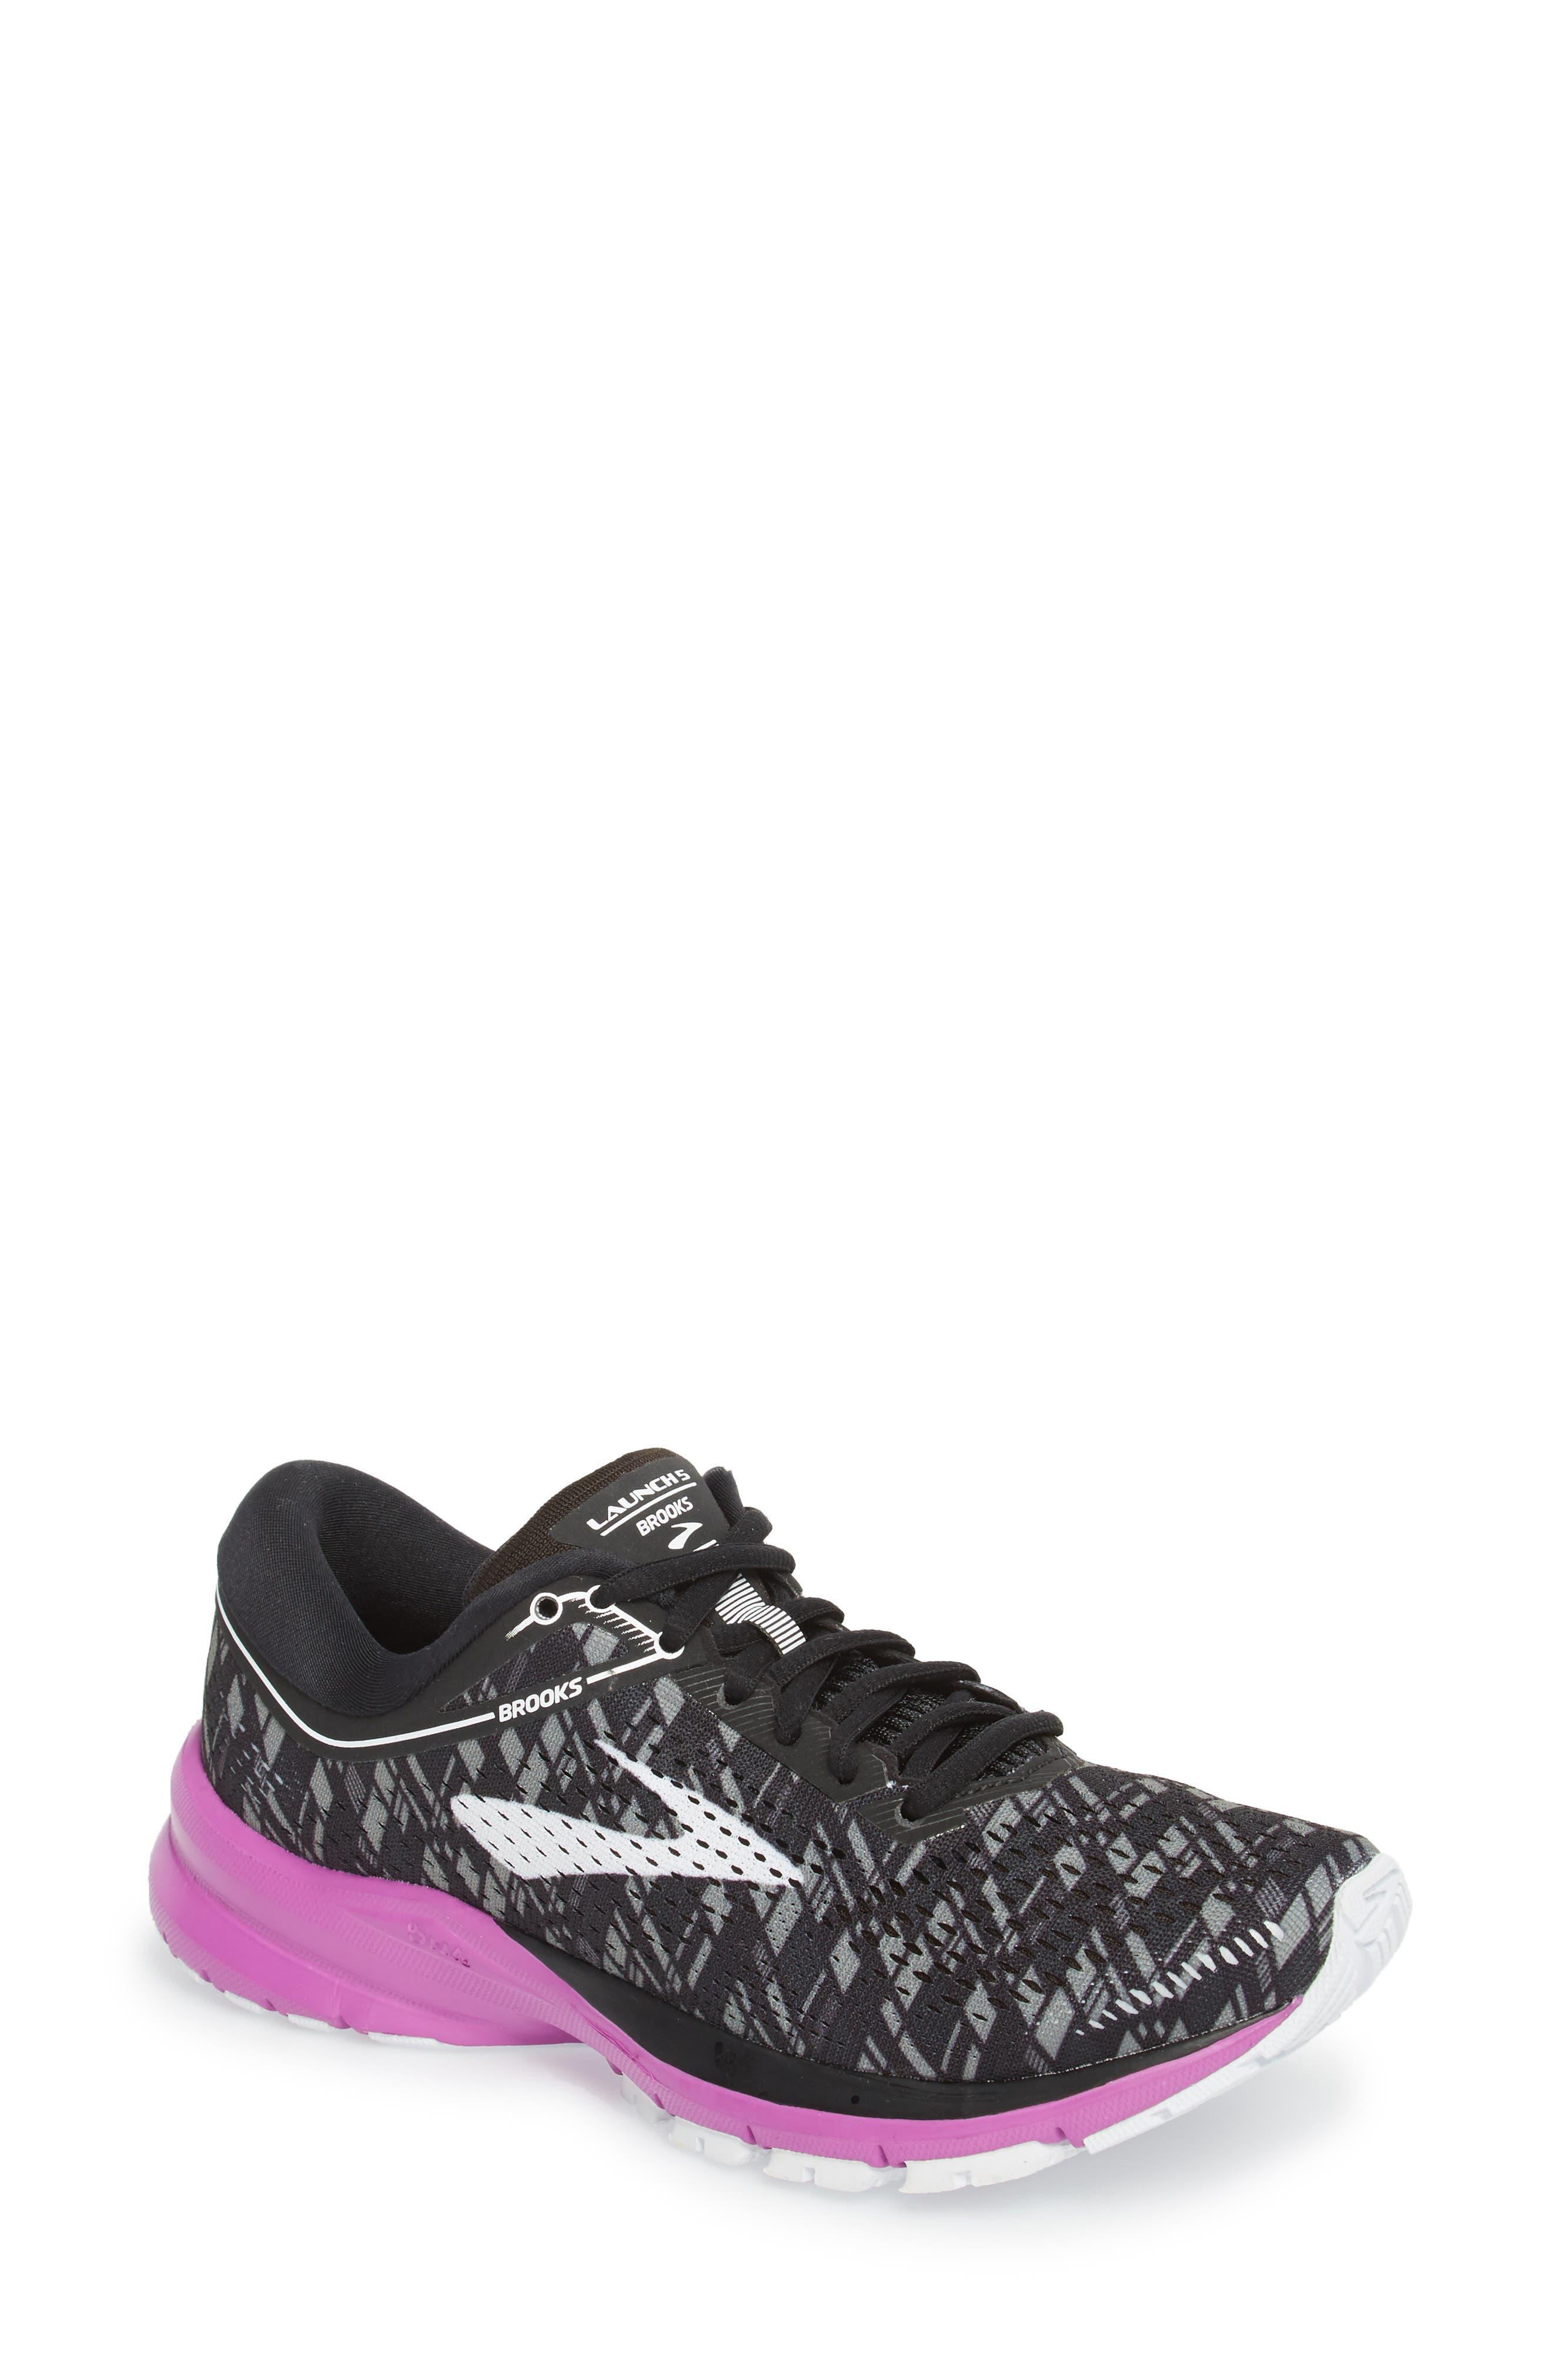 Launch 5 Running Shoe,                             Main thumbnail 1, color,                             BLACK/ PURPLE/ PRINT